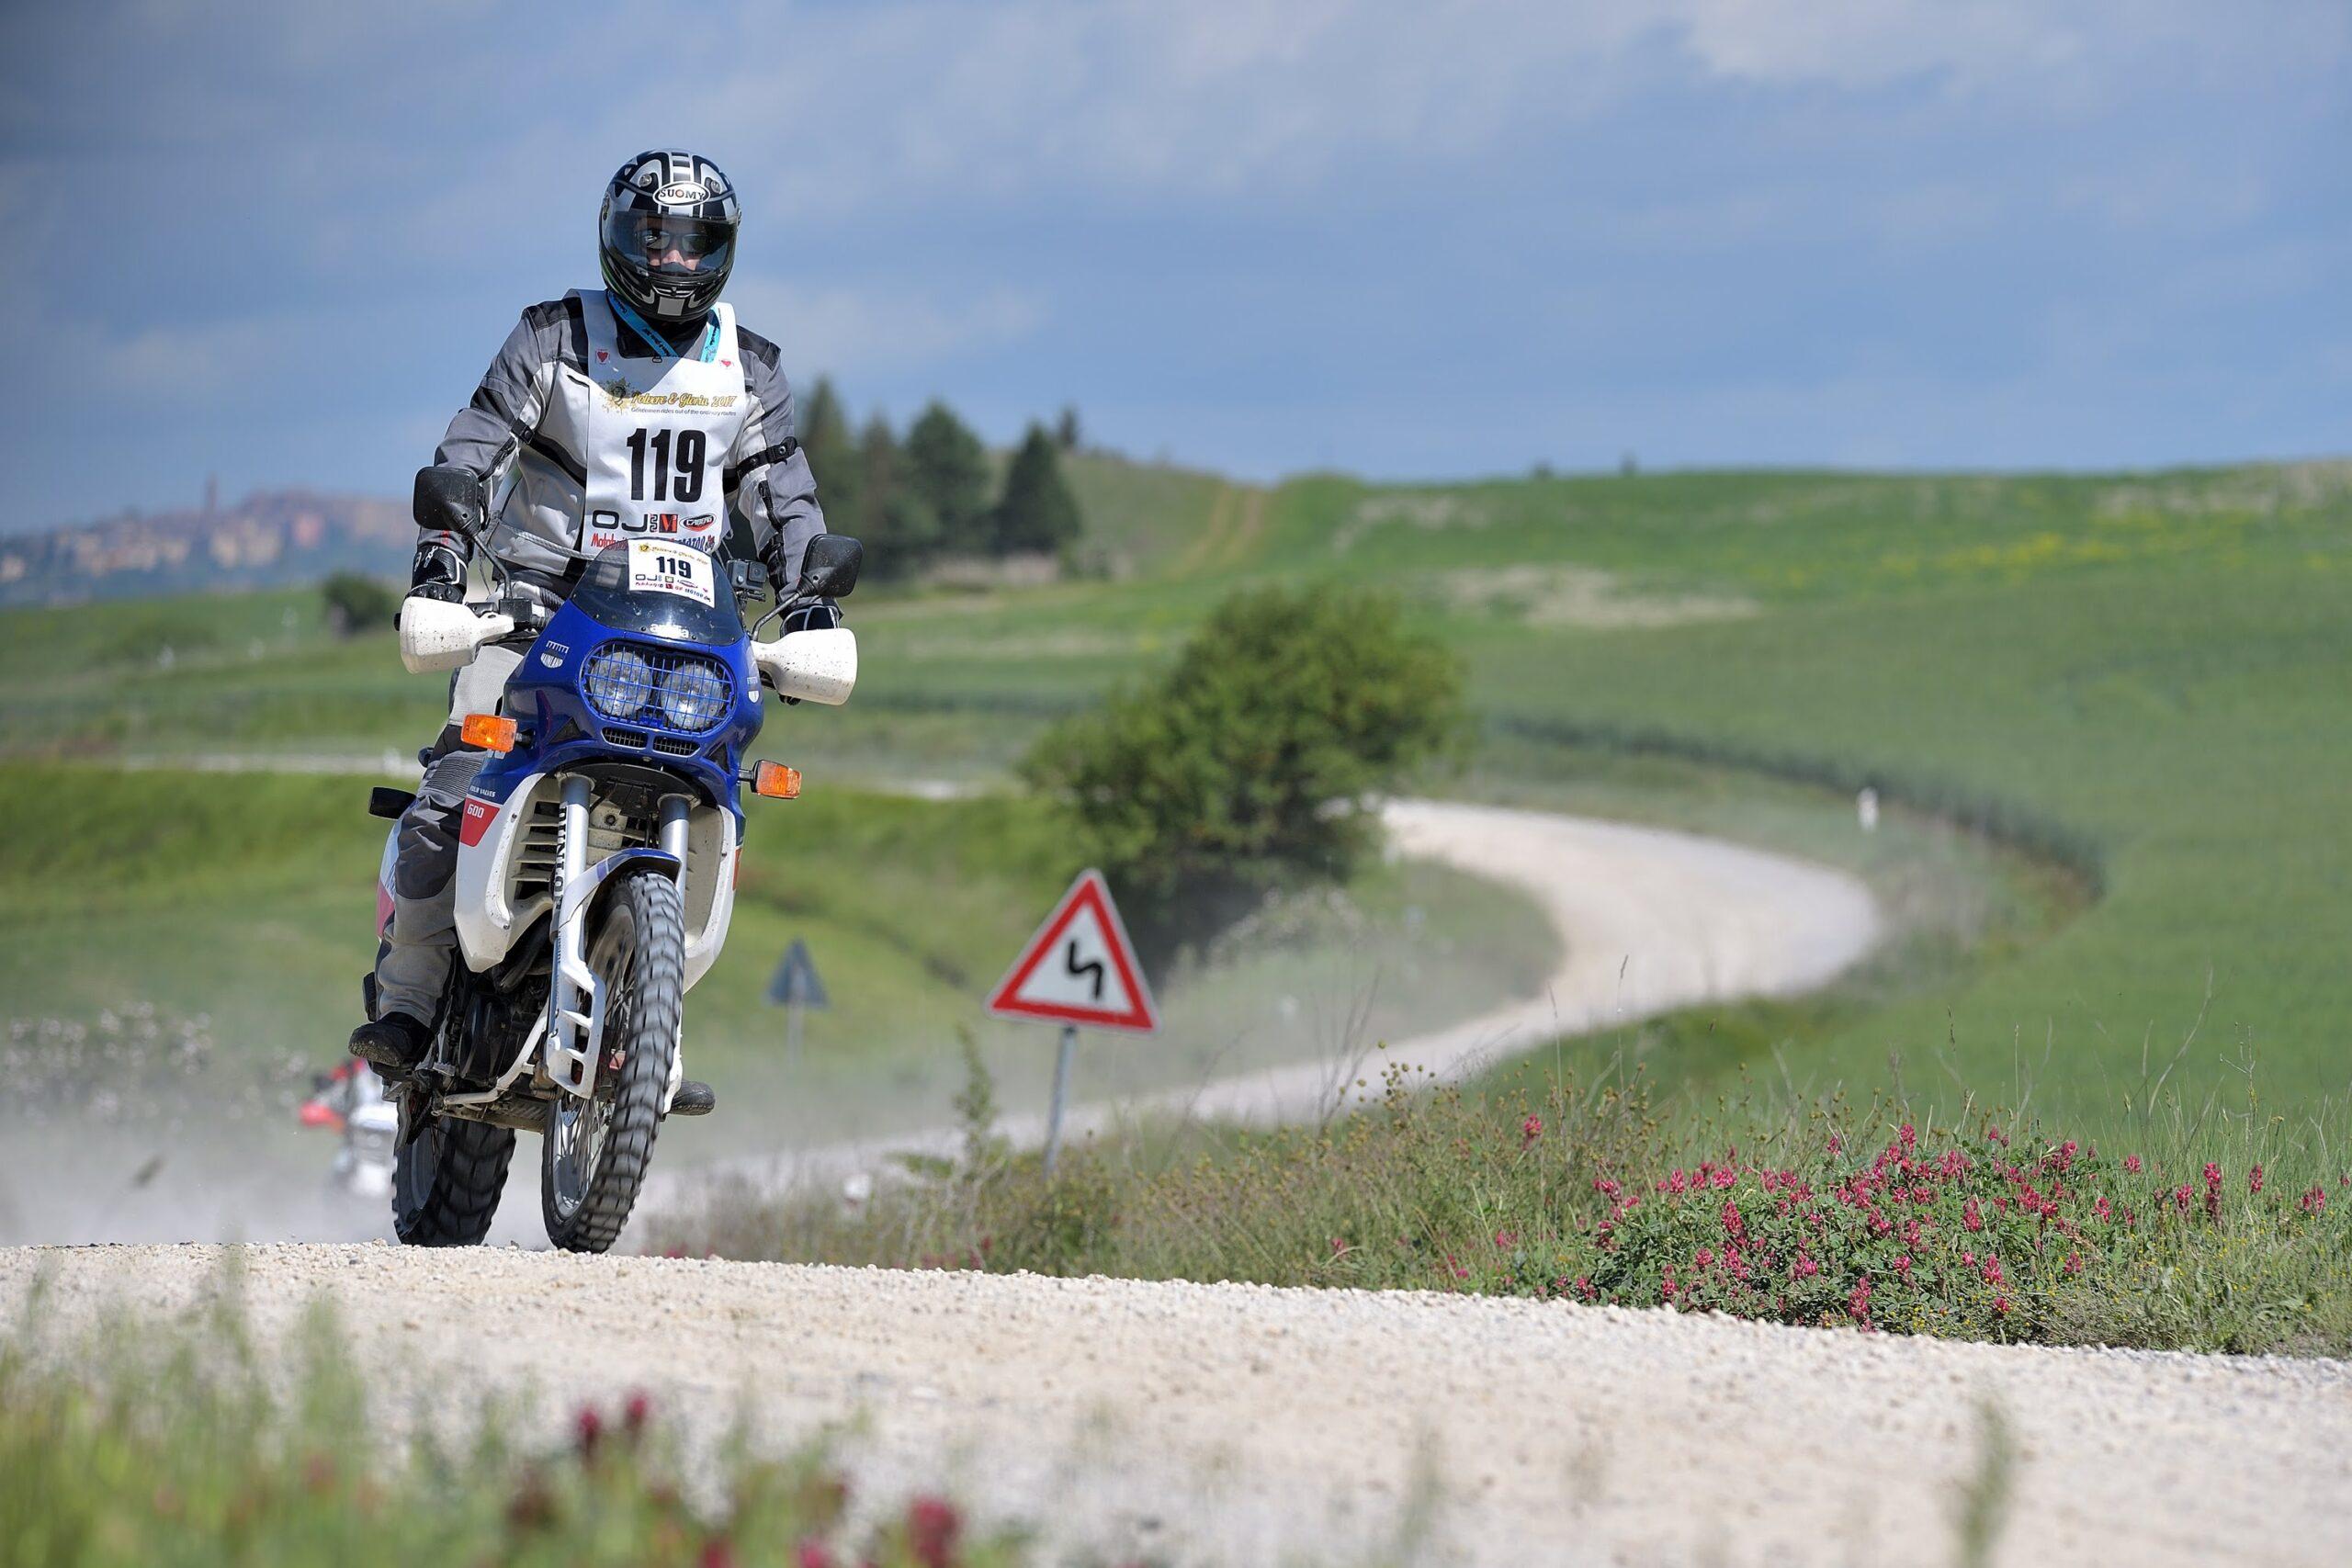 italiainpiega-evento-moto off road 2021